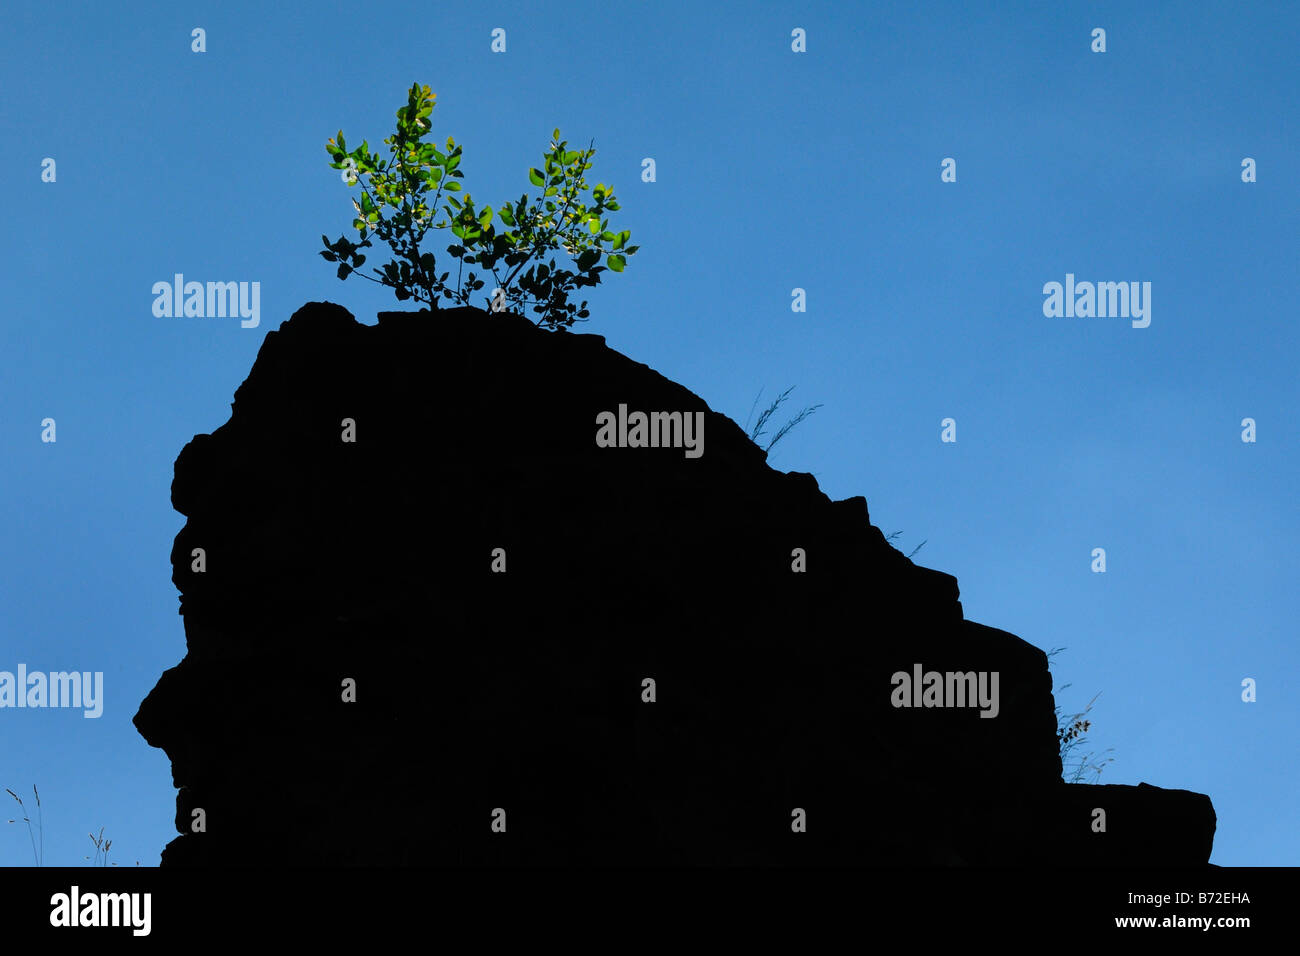 Grüner Zweig auf éinem Felsen green branch on a rock - Stock Image